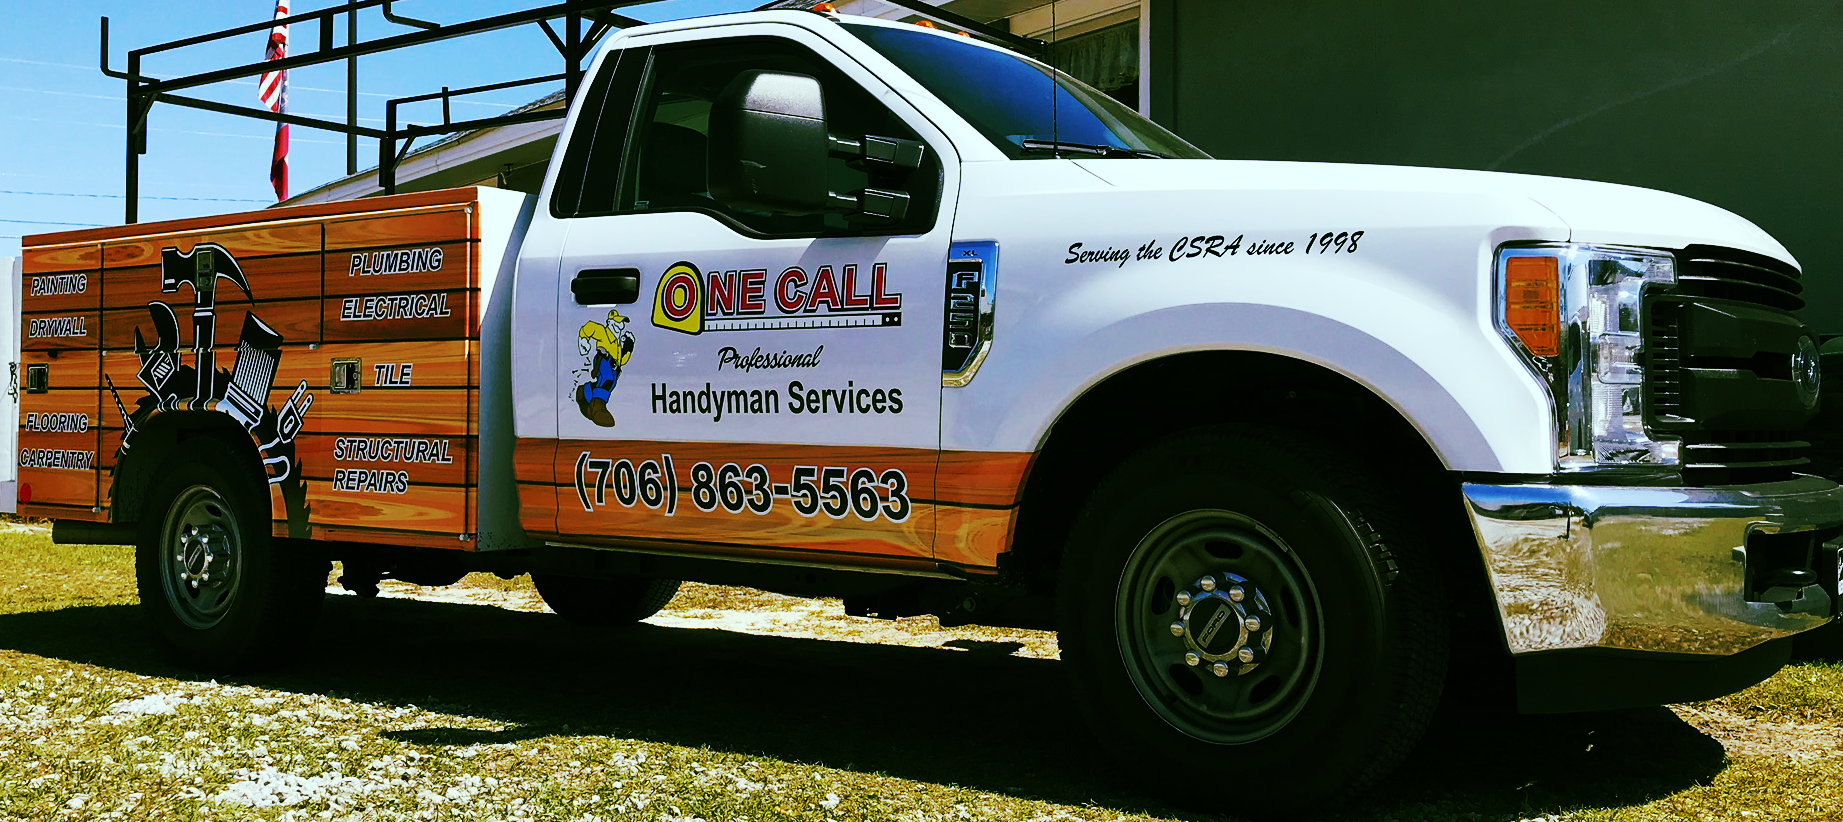 One Call Handyman Services